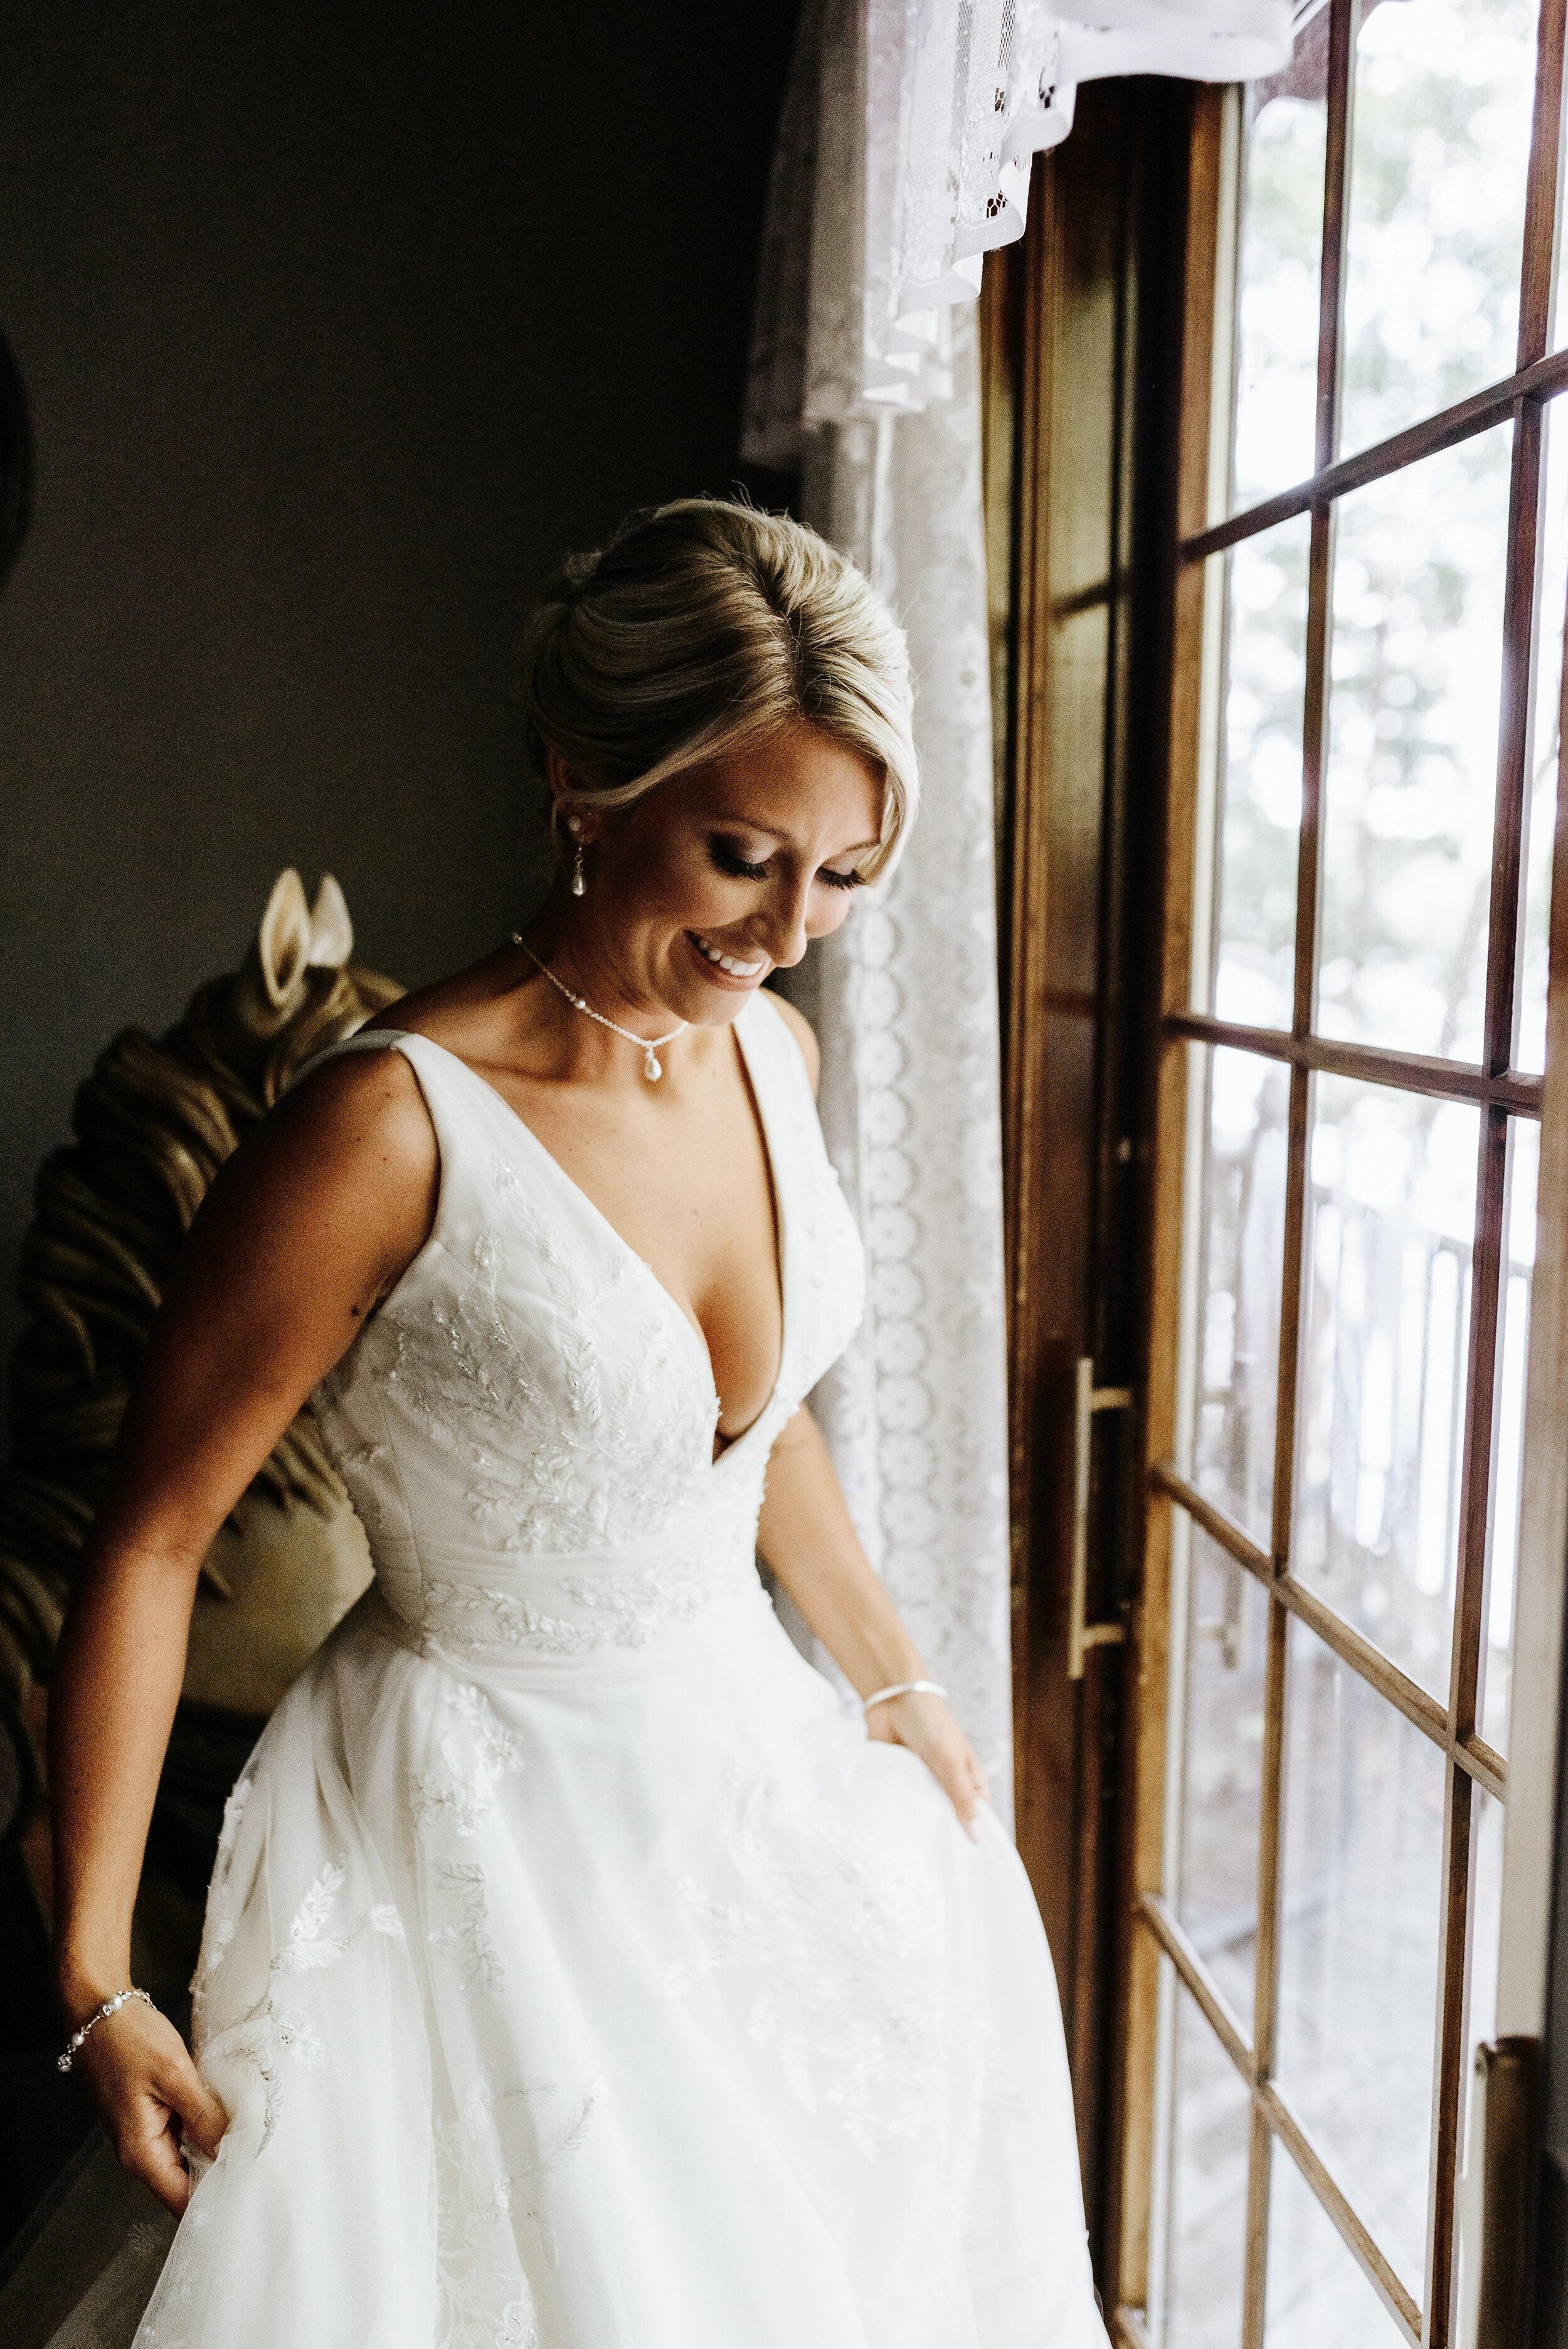 Emily_Mike_Wedding_Celebrations_at_the_Reservoir_Pool_Pavilion_Richmond_Virginia_Wedding_Photographer_Photography_by_V_11.jpg